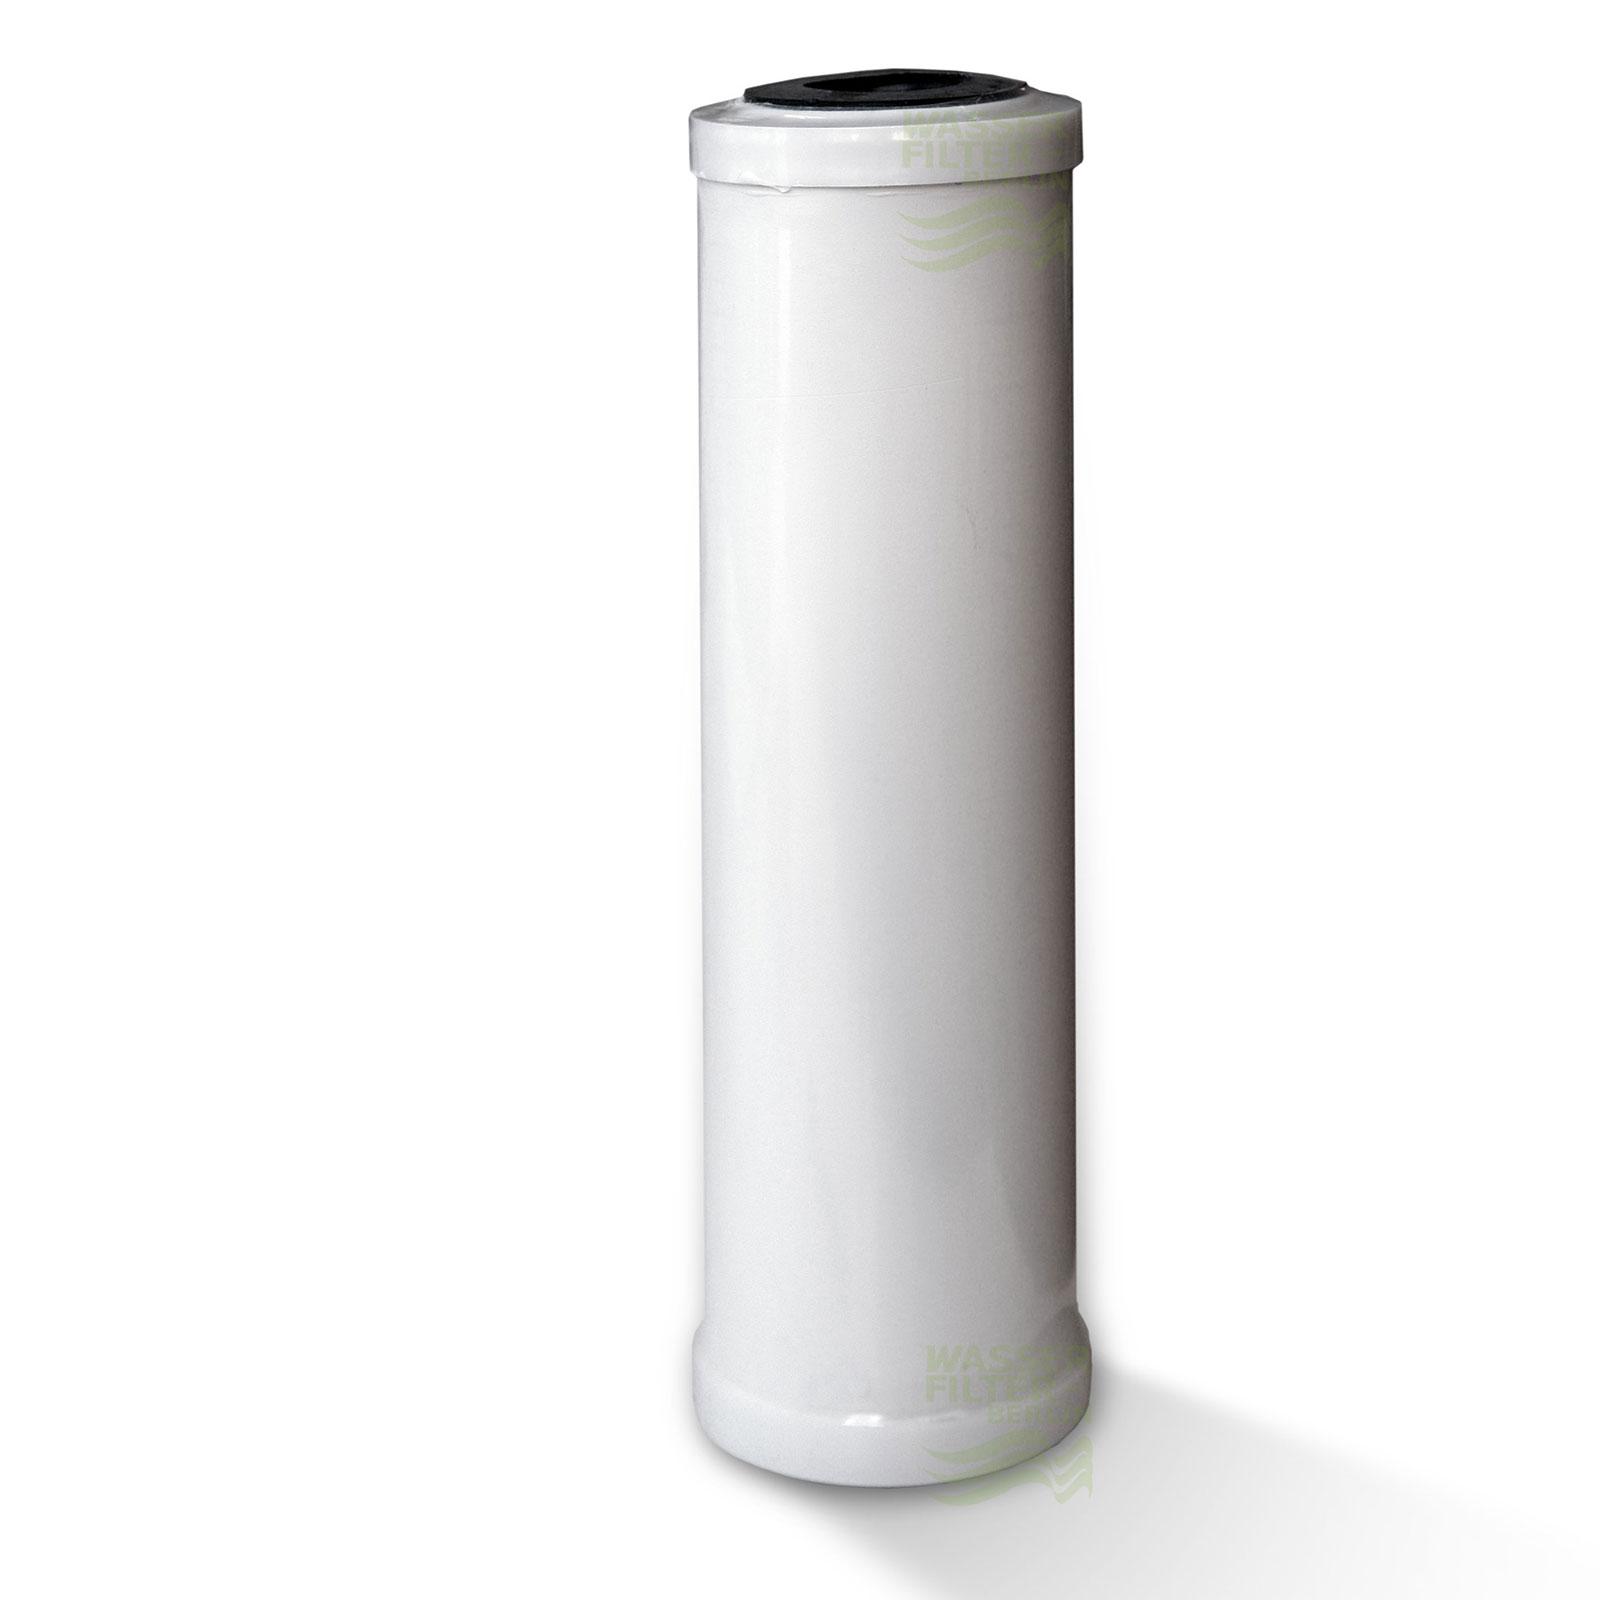 Keramikfilterpatrone Wasserfilter Ersatzfilter